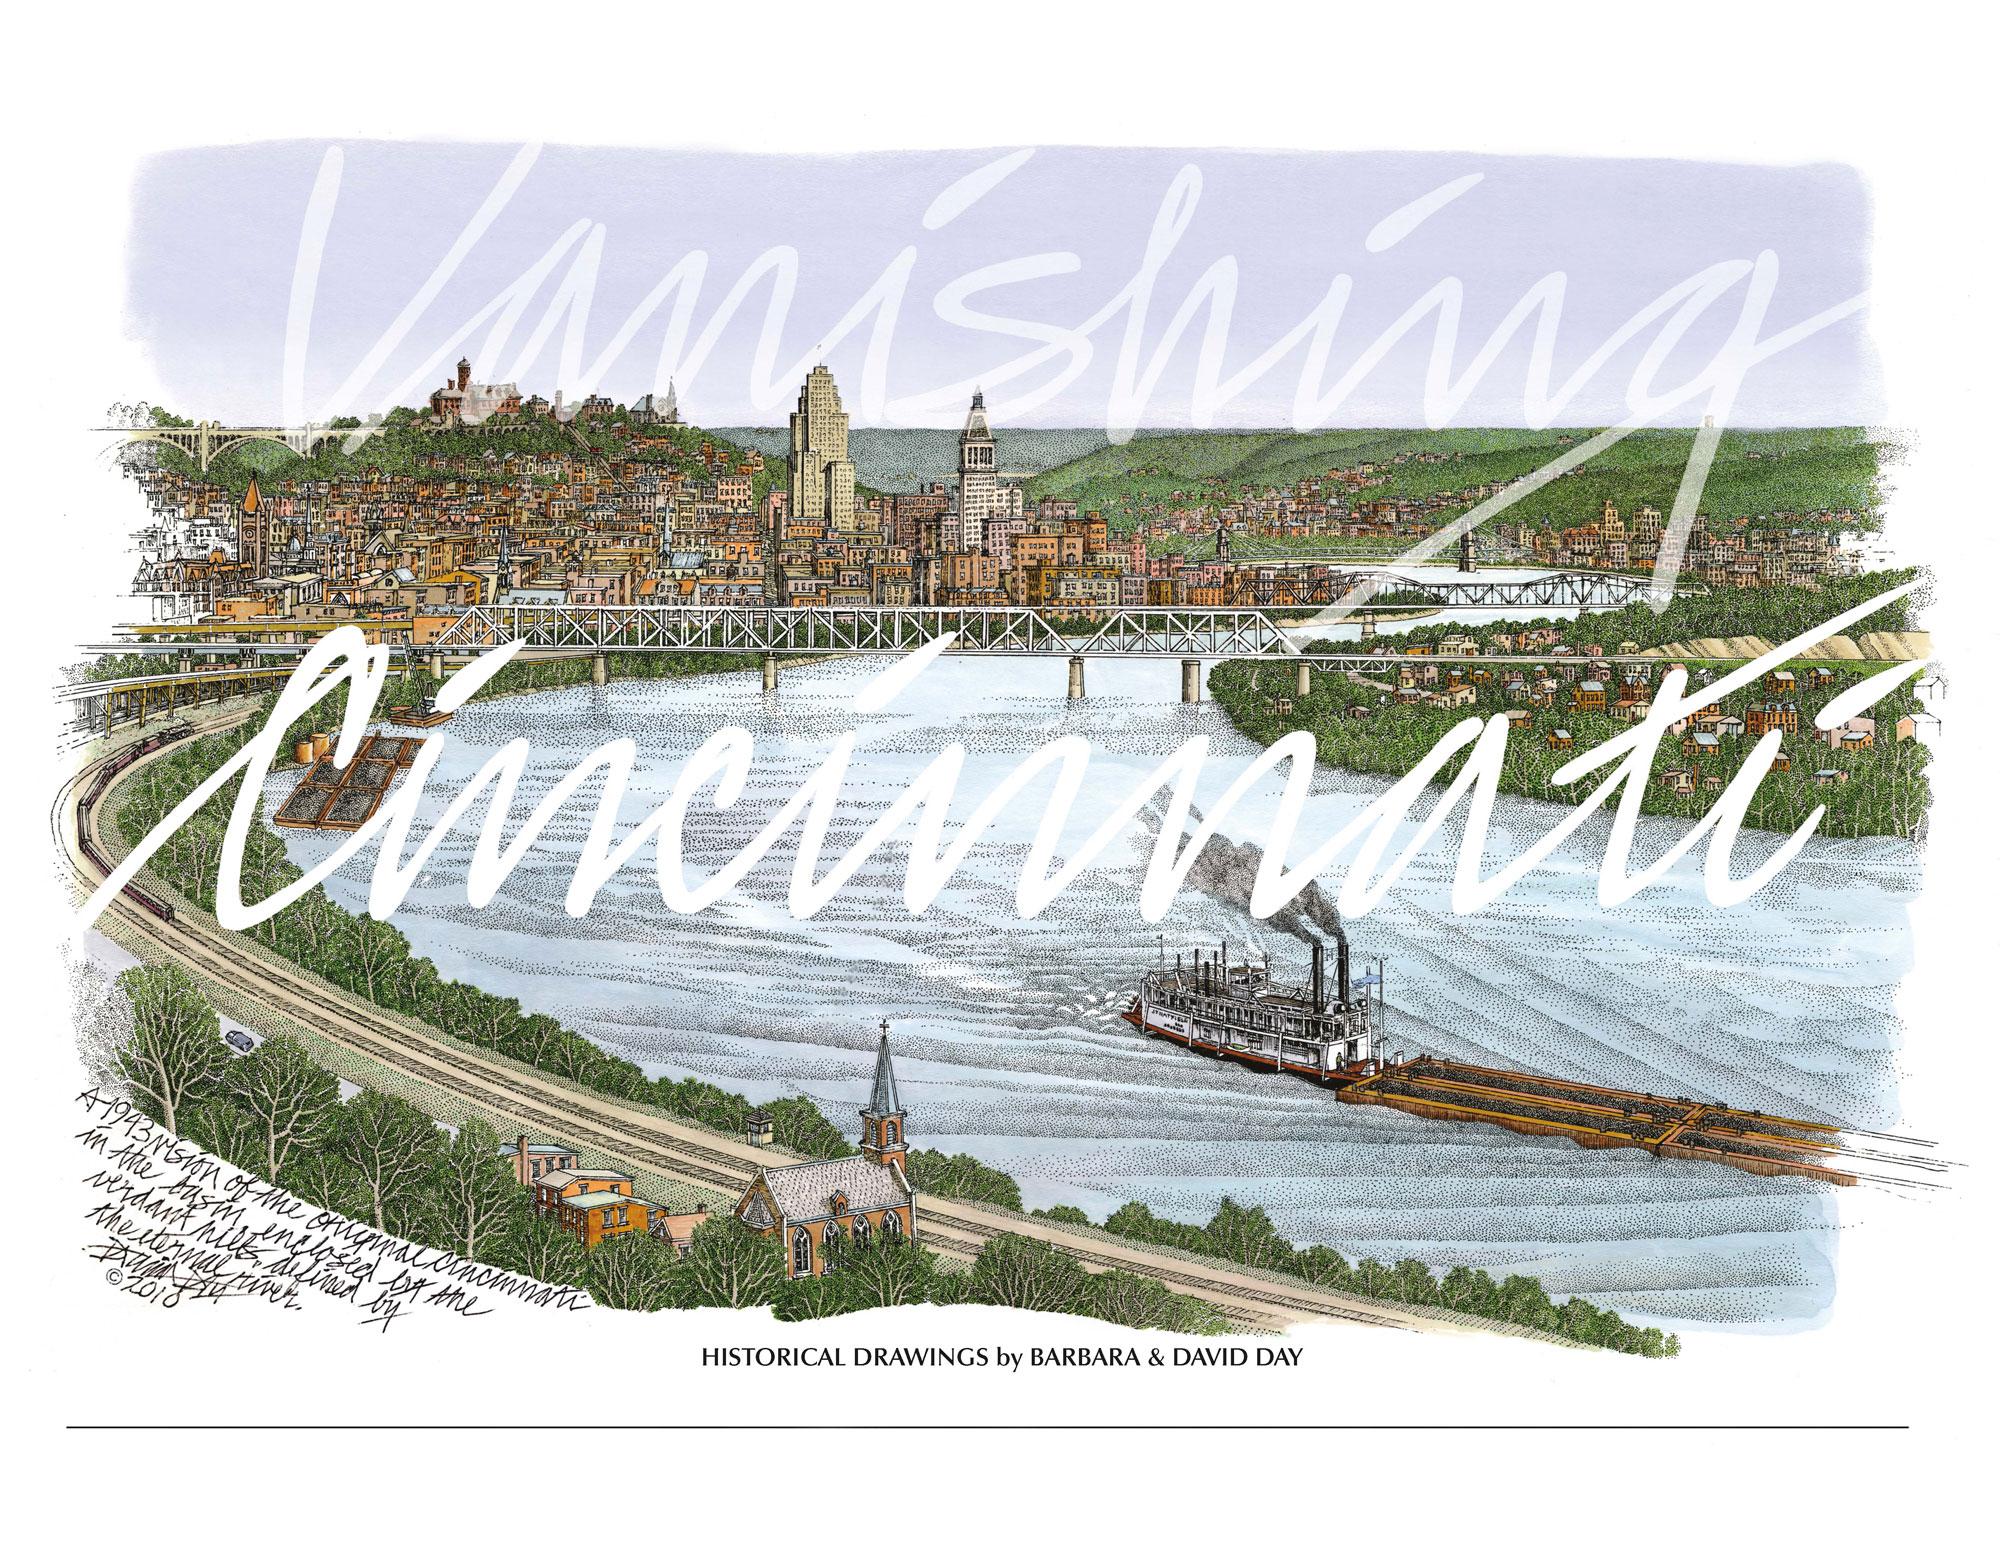 David and Barbara Day's book, Vanishing Cincinnati